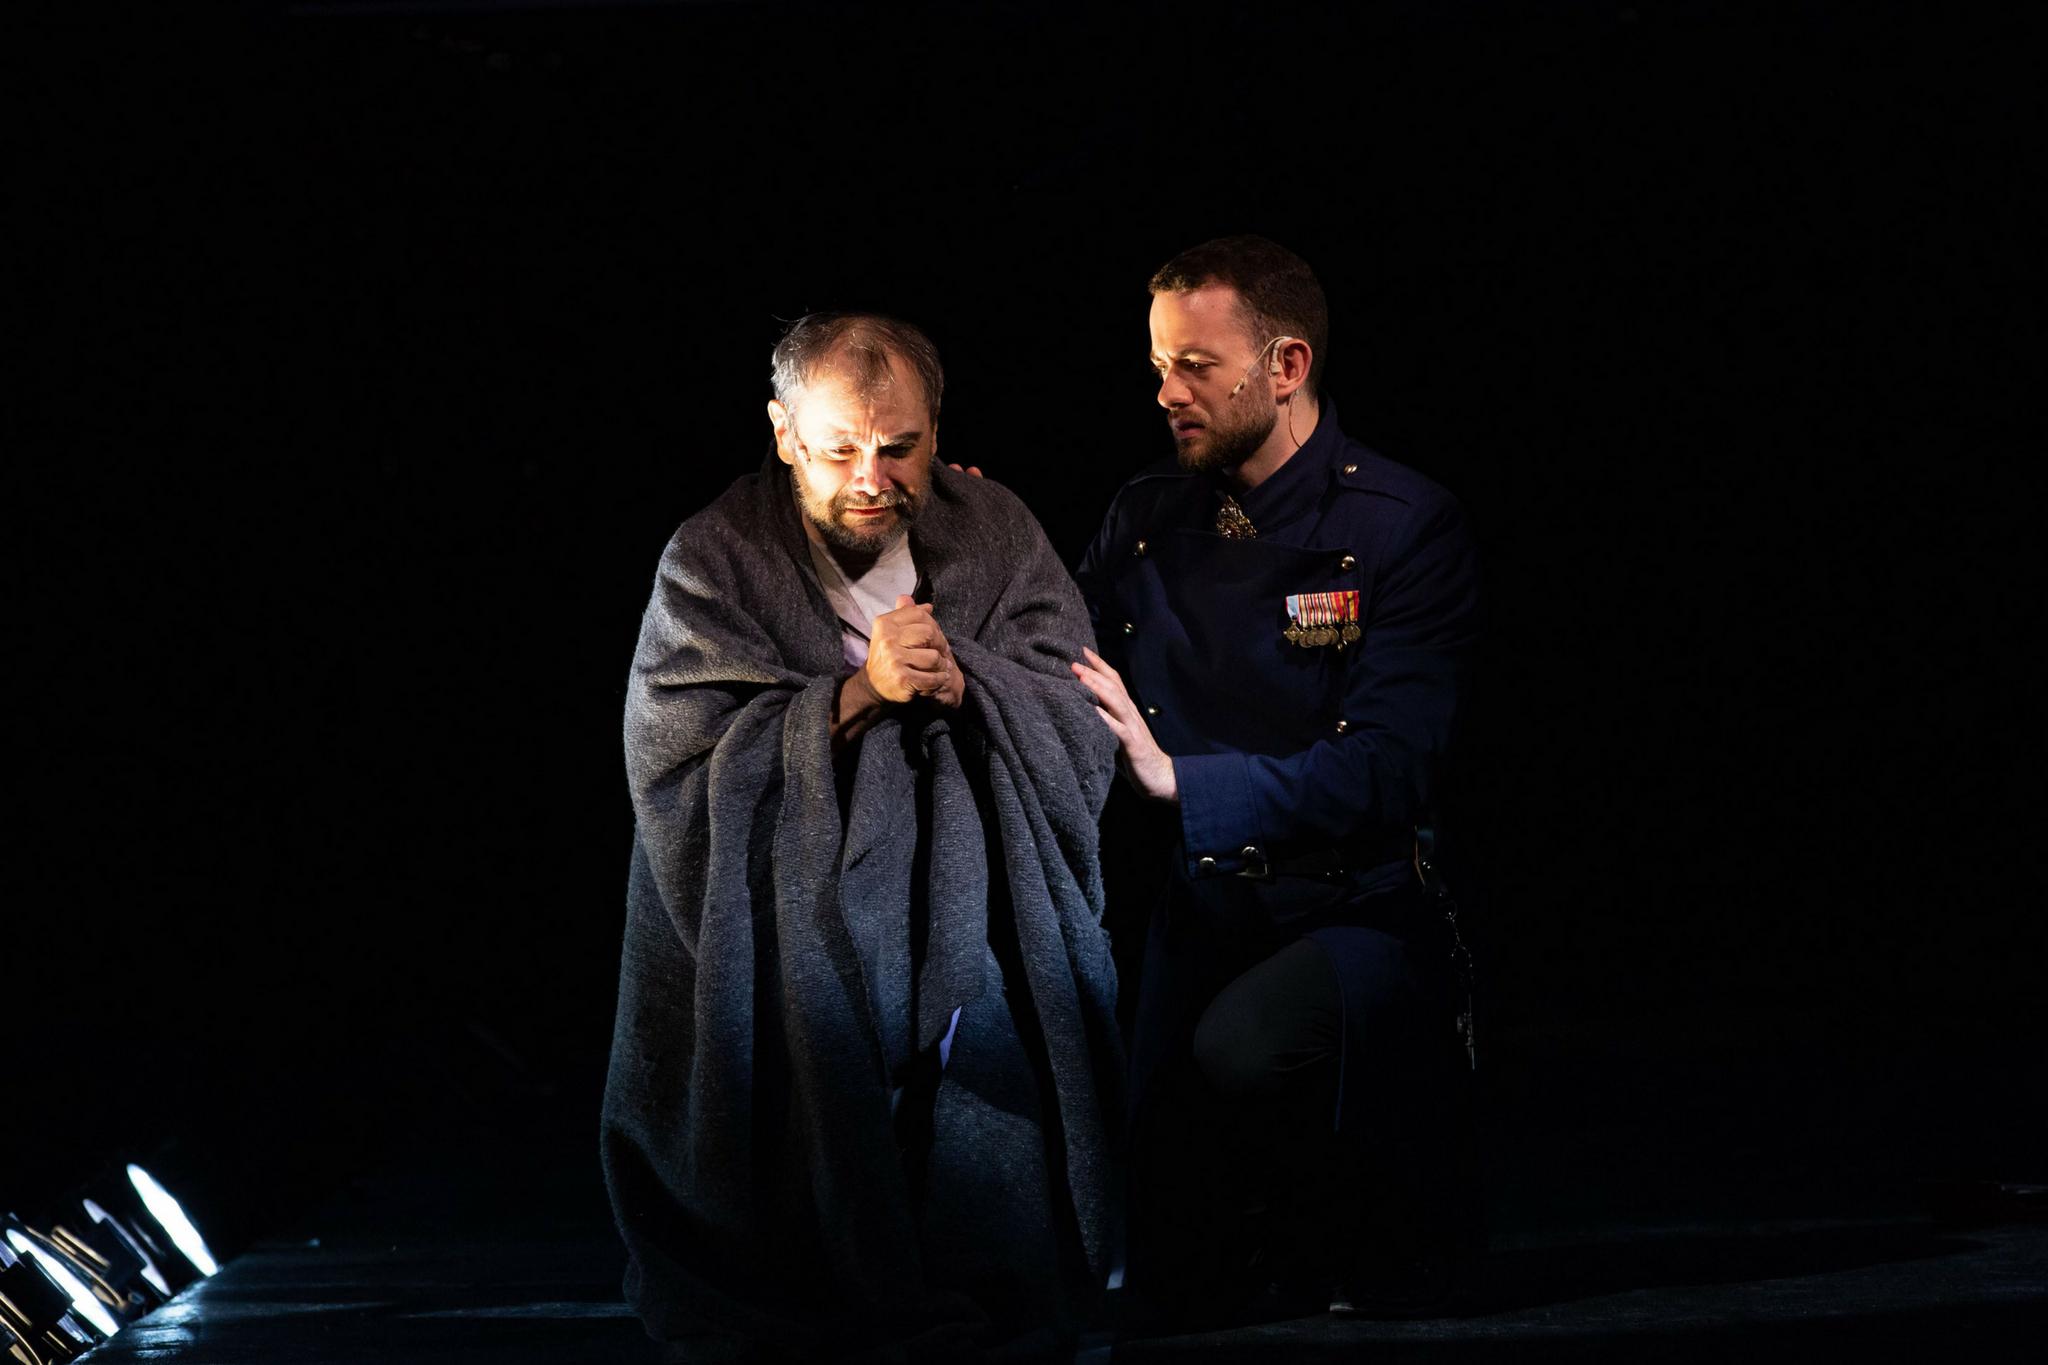 Remo Airaldi (Clarence) and Kody Grassett (Brakenbury) in Richard III, Shakespeare on the Common 2018-Photo by Evgenia Eliseeva